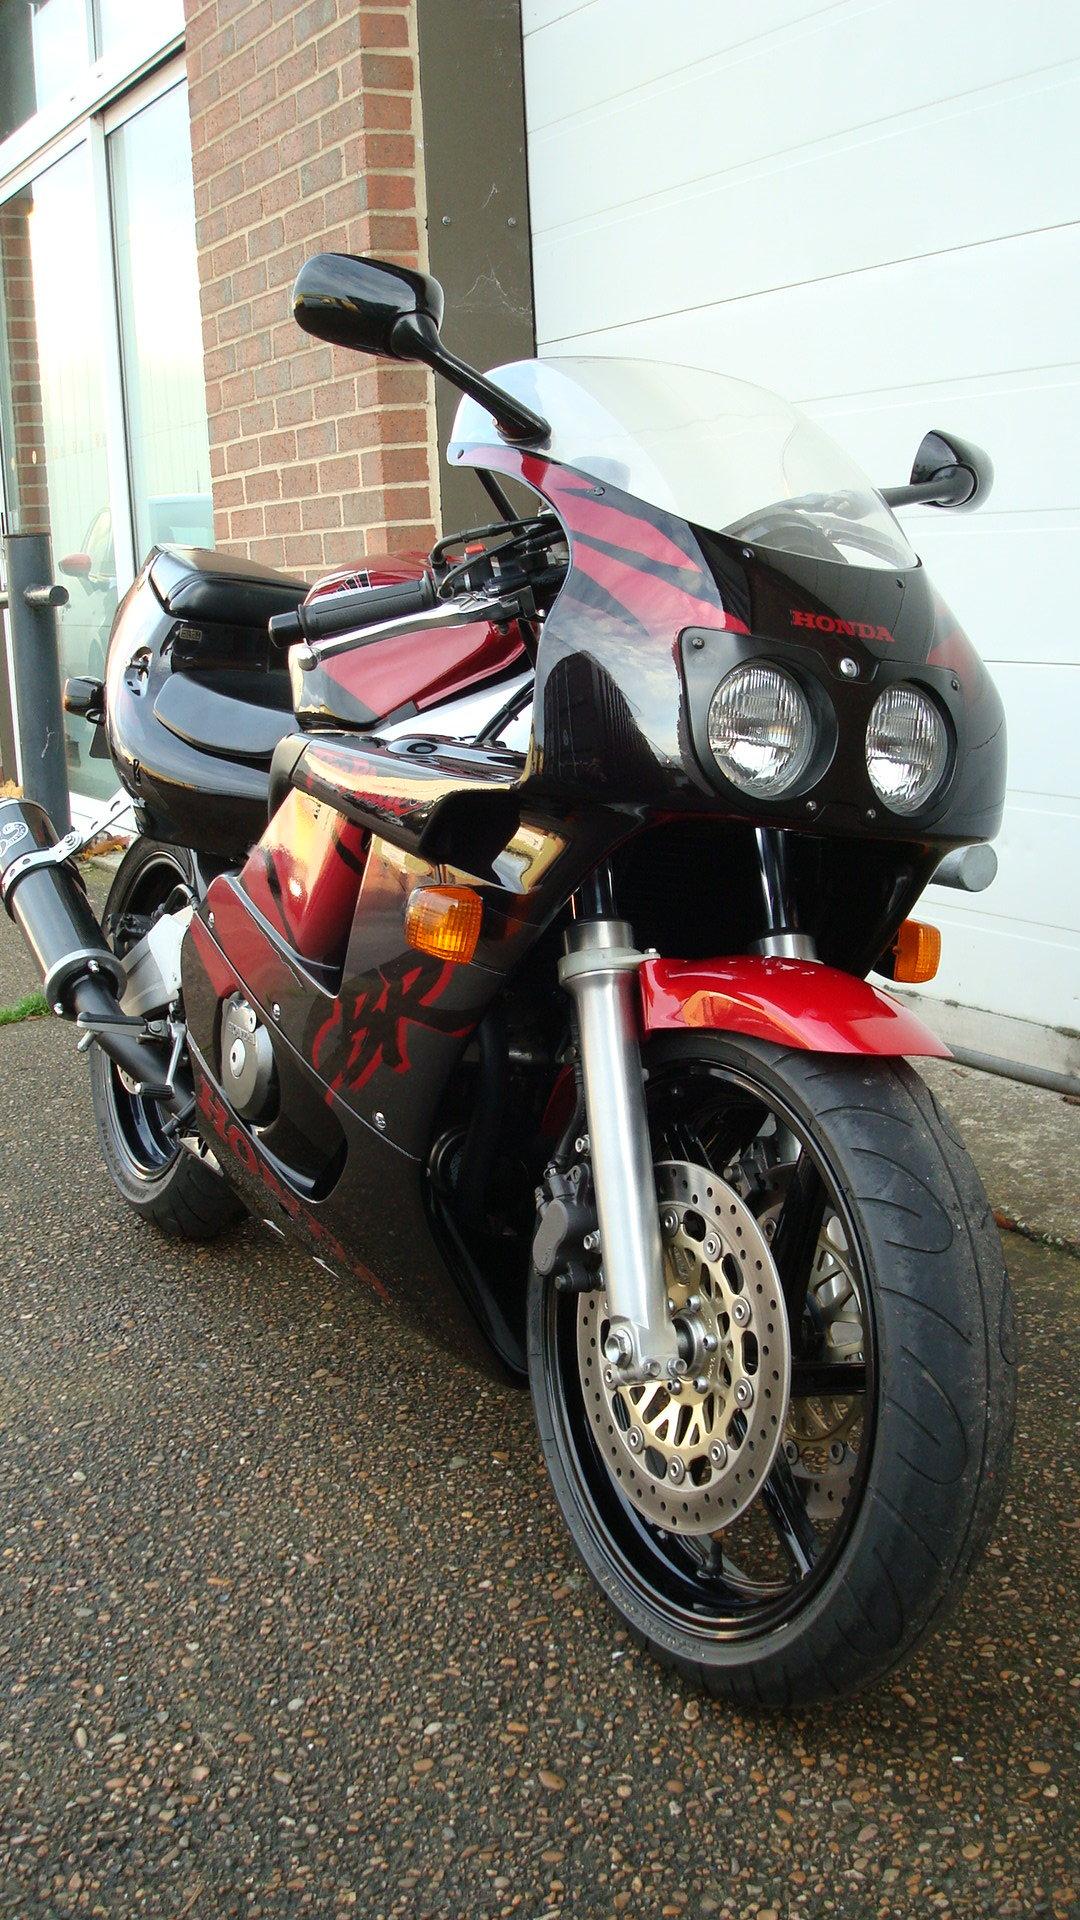 Honda CBR400 RR-R 1998-R **LOW KMS,EXCELLENT CONDITION** For Sale (picture 2 of 6)